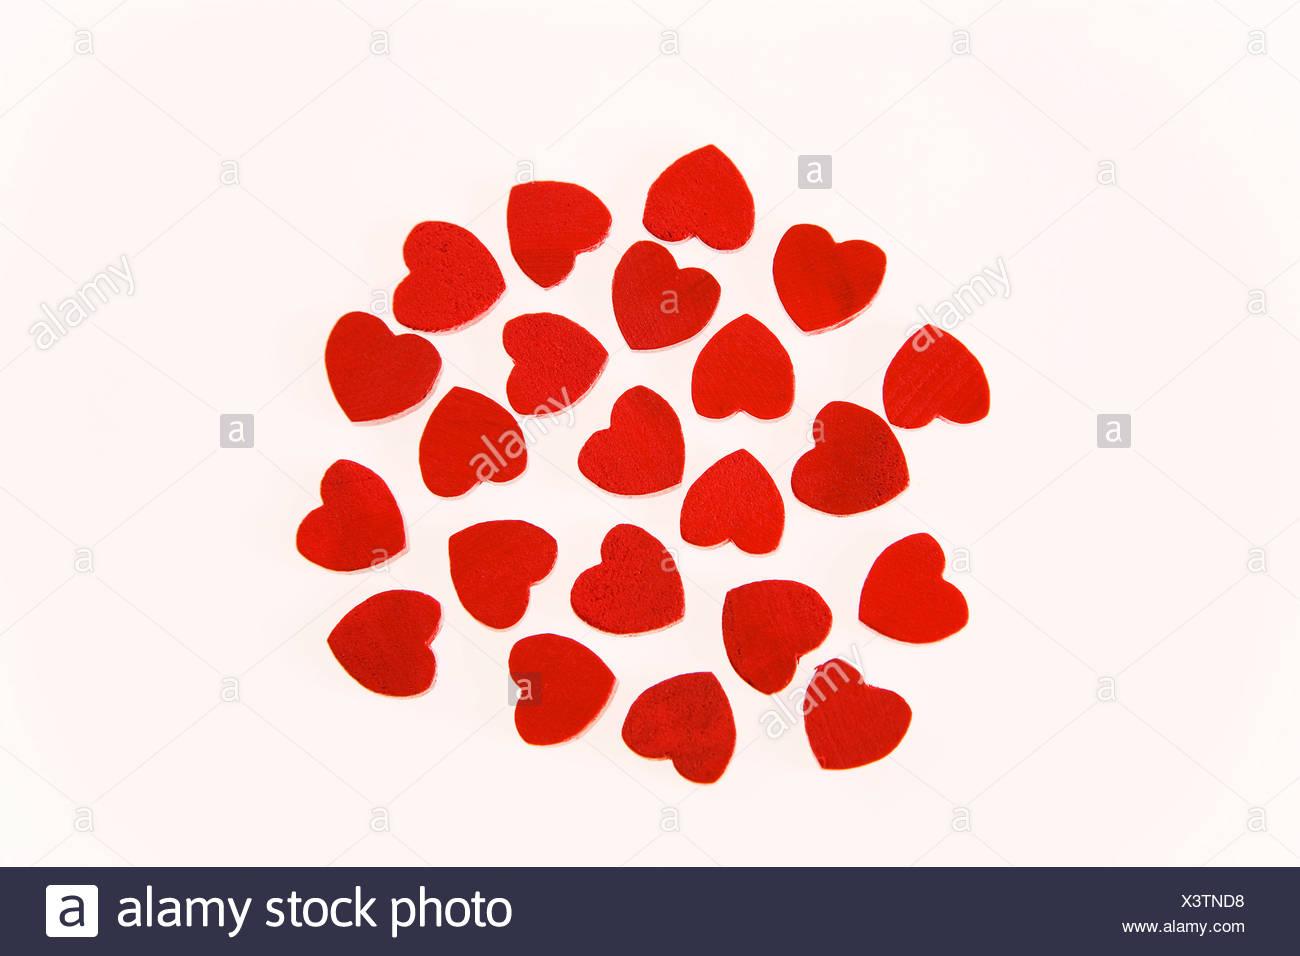 Genre Gift Heart In love Love Loving Red Concept Studio - Stock Image